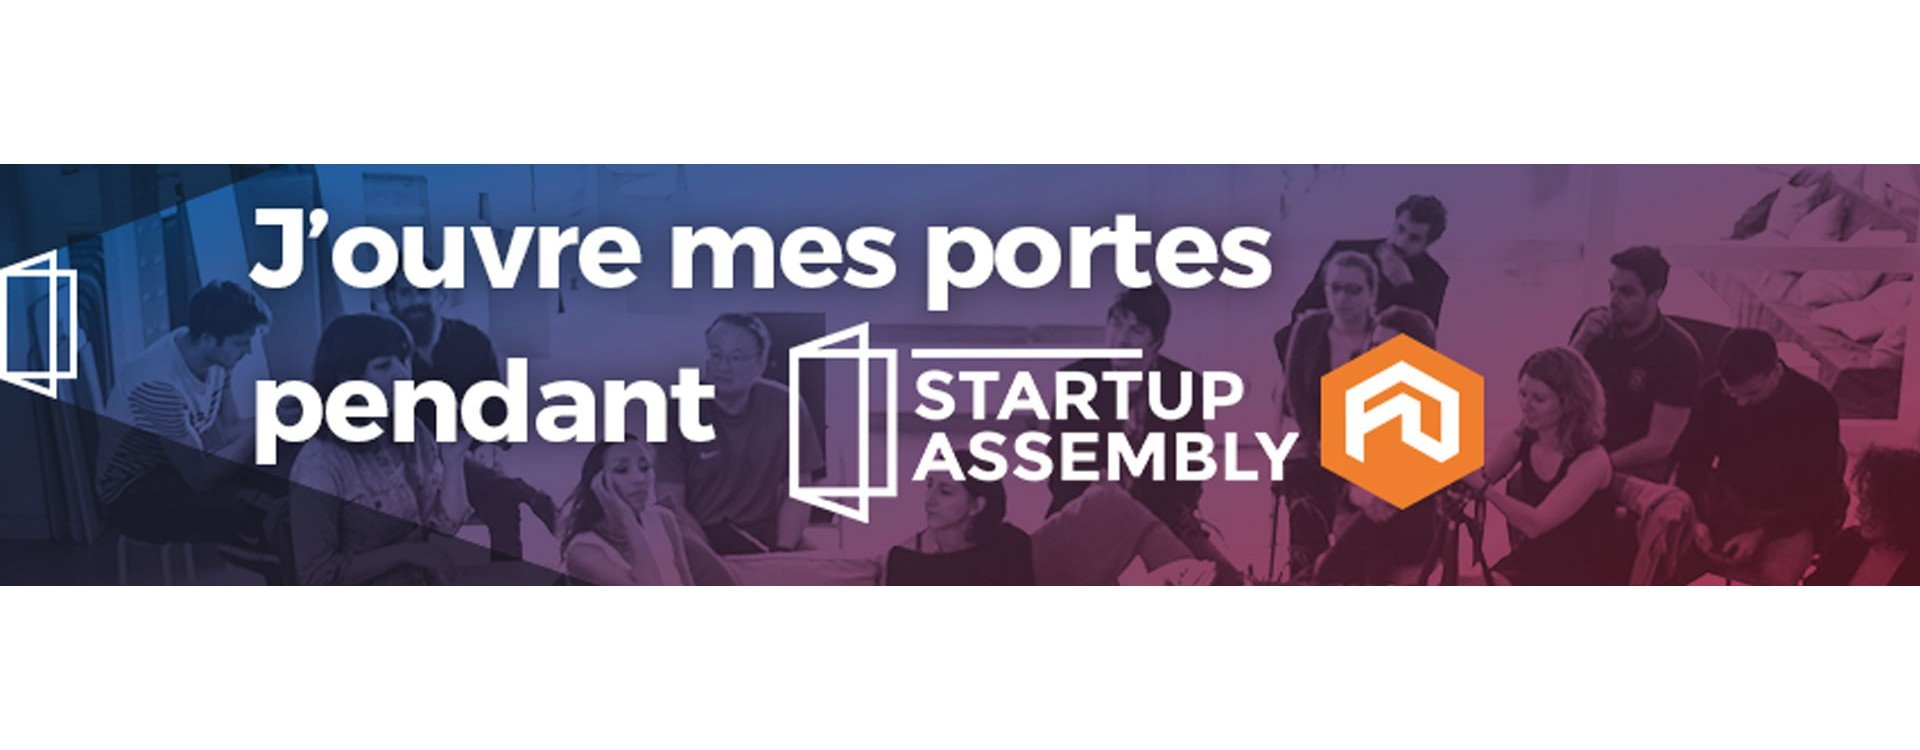 L'aper'overade a la start-up assembly